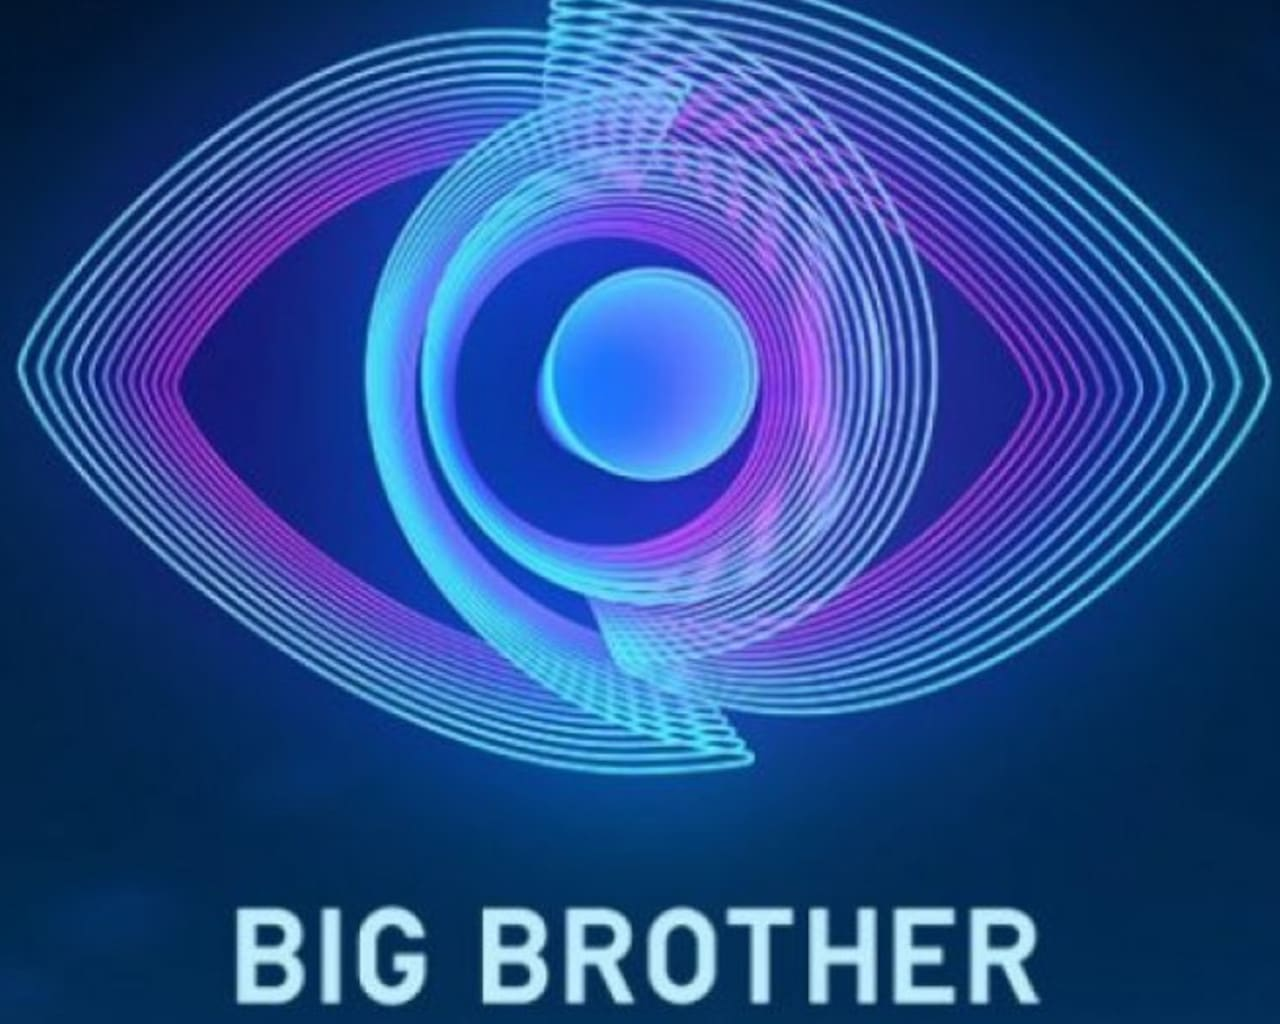 big brother,big brother,big brother spoiler,big brother live streaming,big brother νεα,big brother αποχώρηση,big brother παικτεσ,big brother υποψηφιοι,big brother twitter